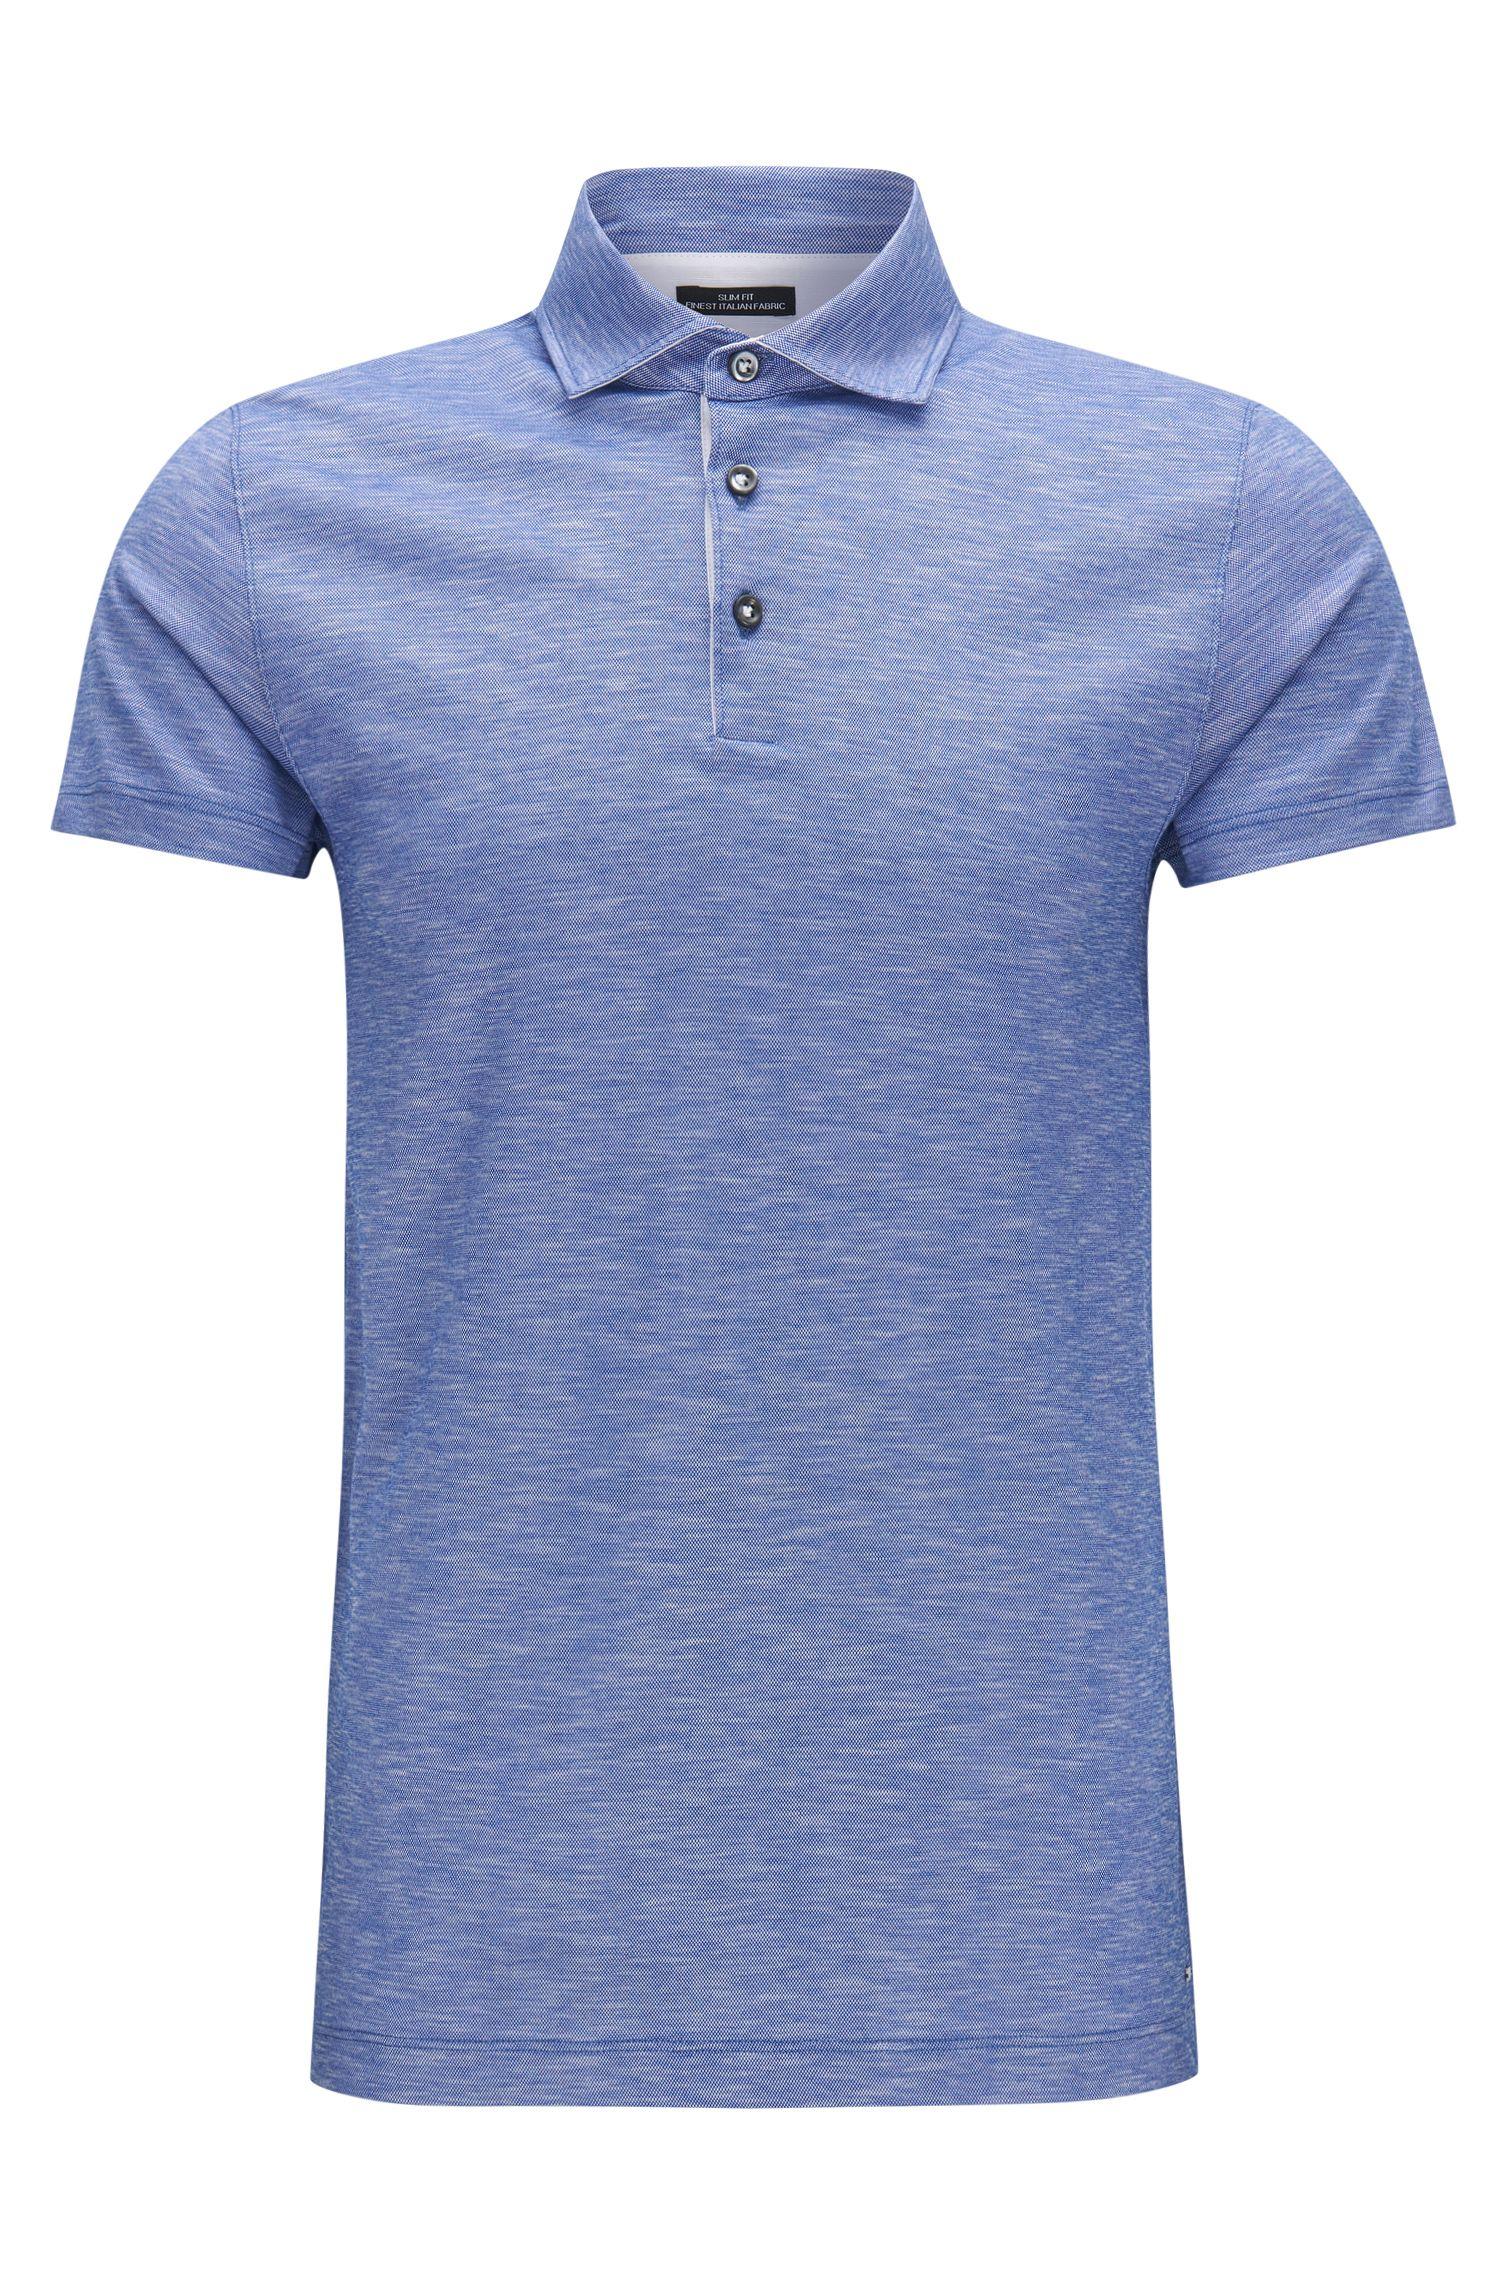 Italian Cotton Polo Shirt, Slim Fit | T-Pryde